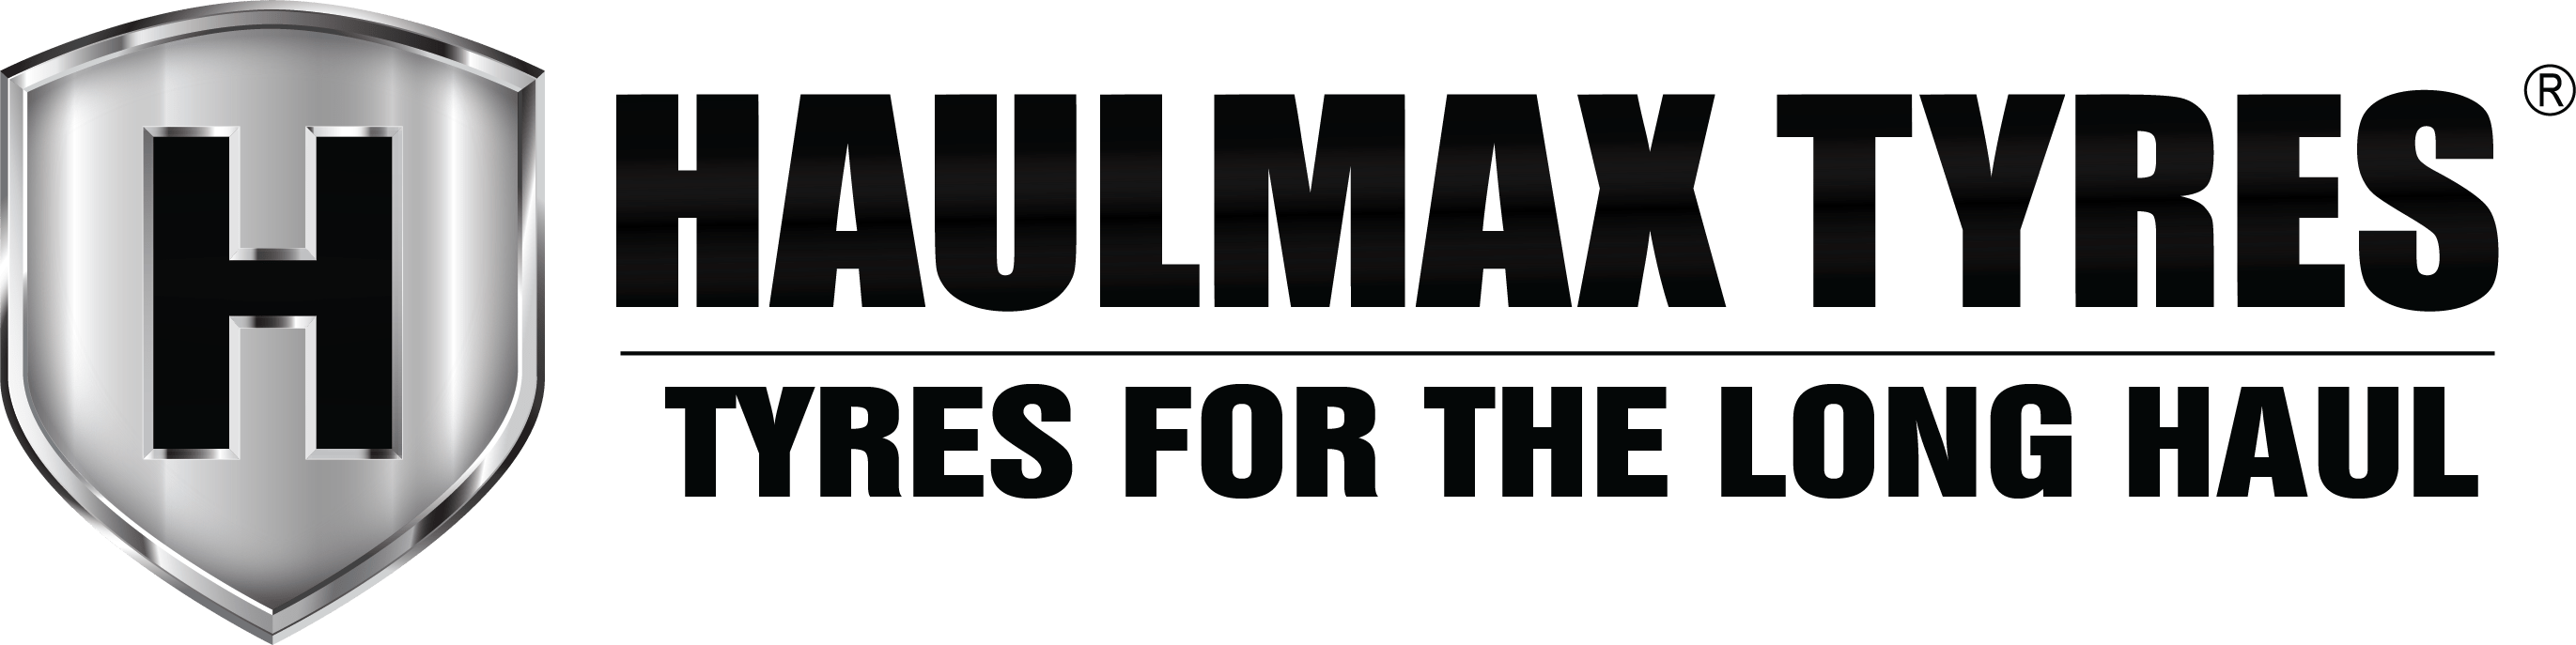 haulmax